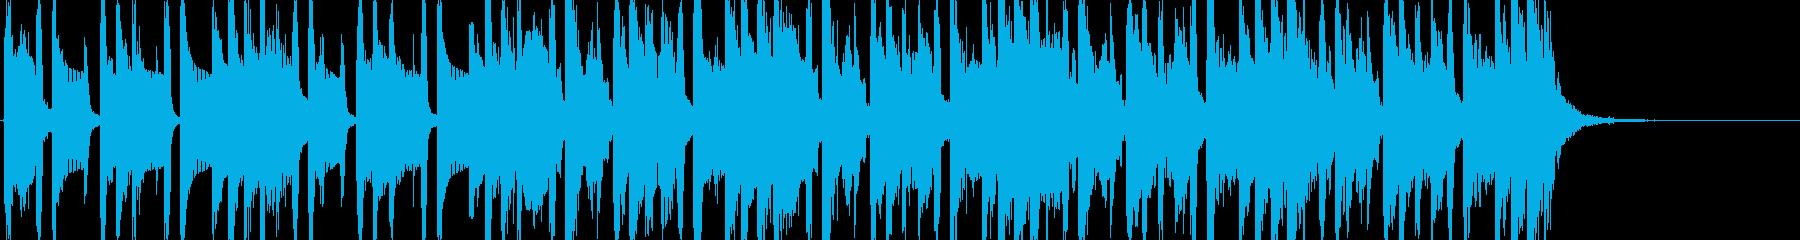 Kpop/中毒性/セクシー/サックスの再生済みの波形